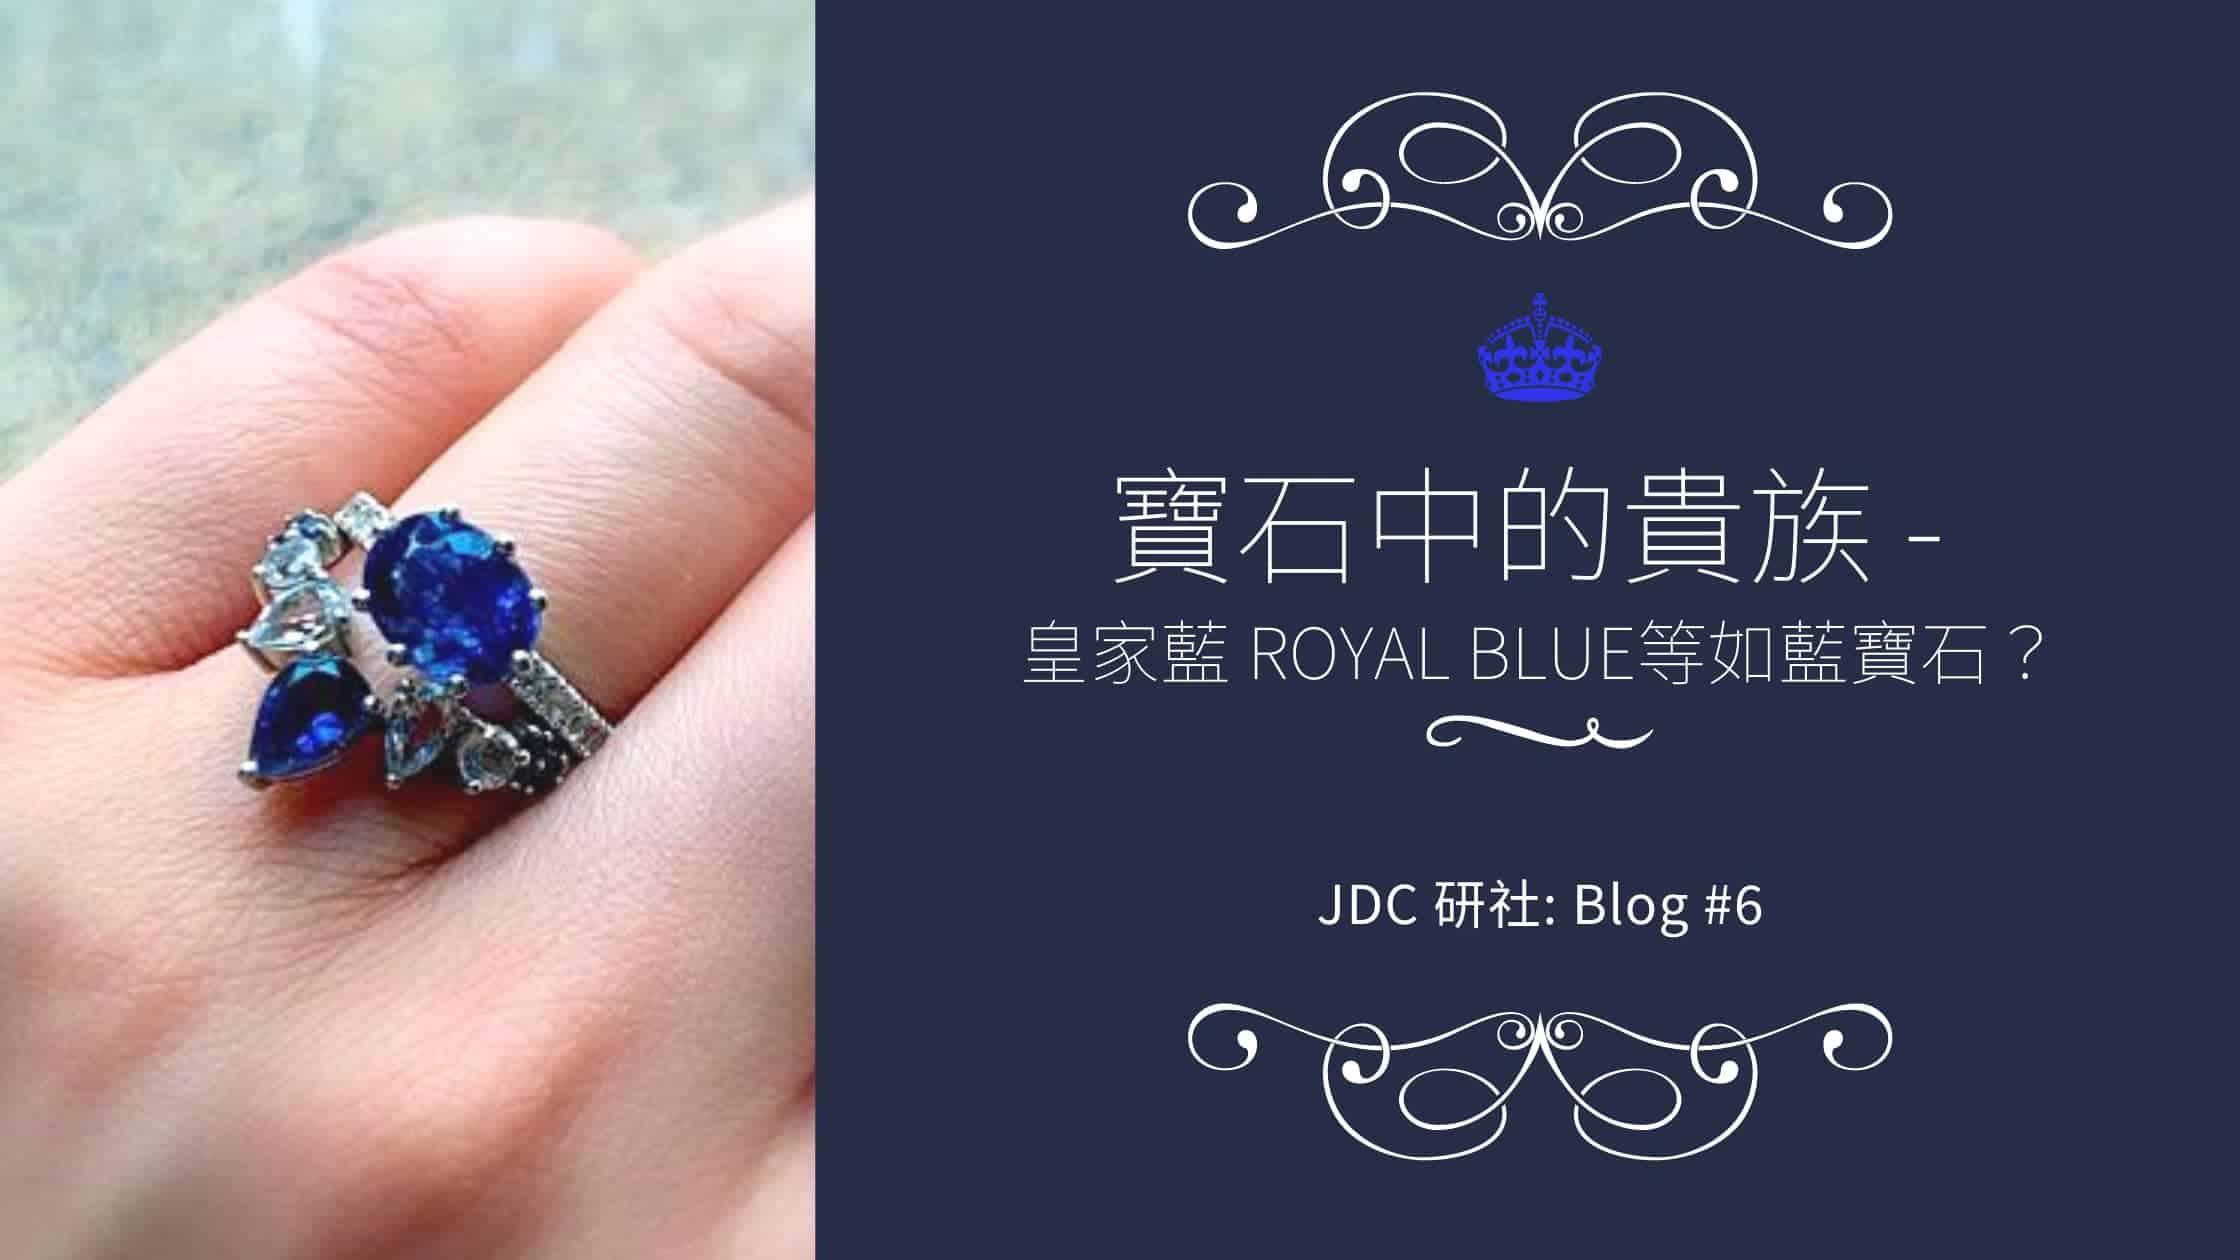 JDC Blog 6